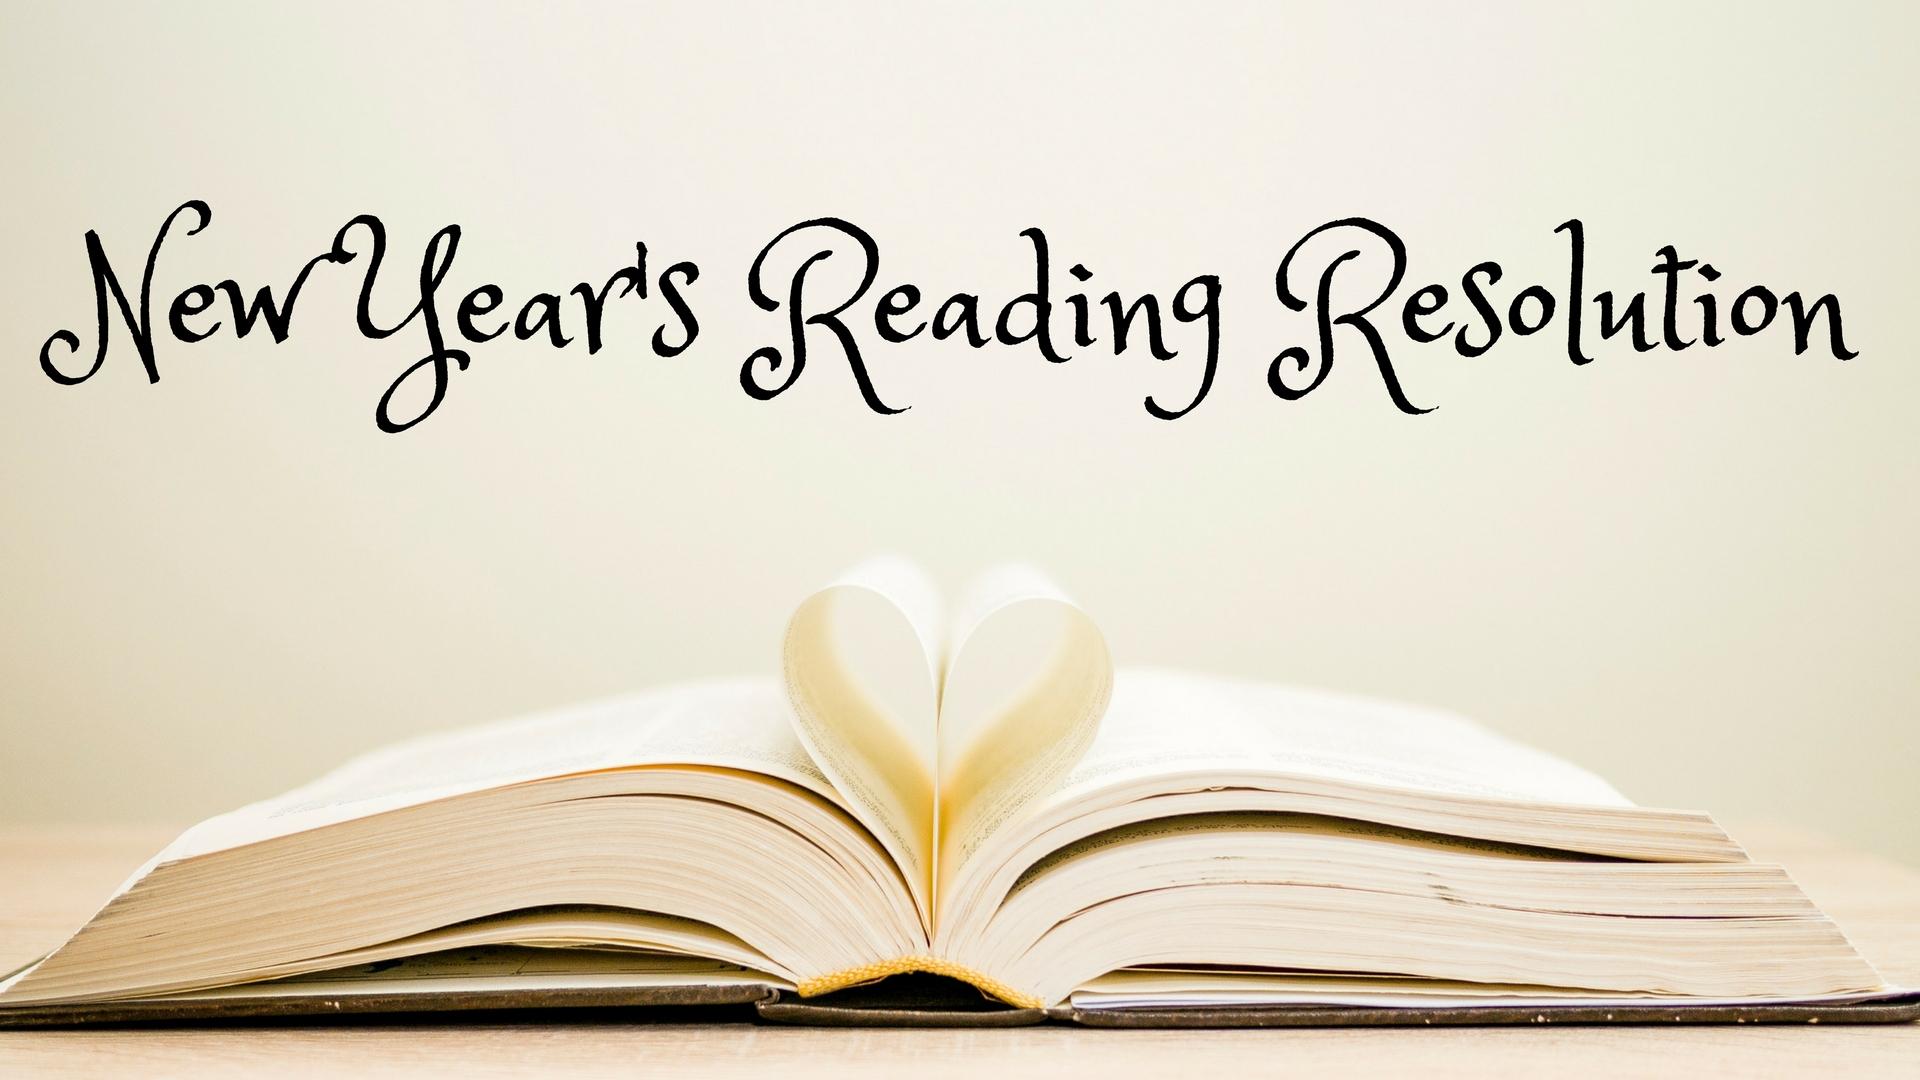 banner-New Year's Reading Resolution.jpg